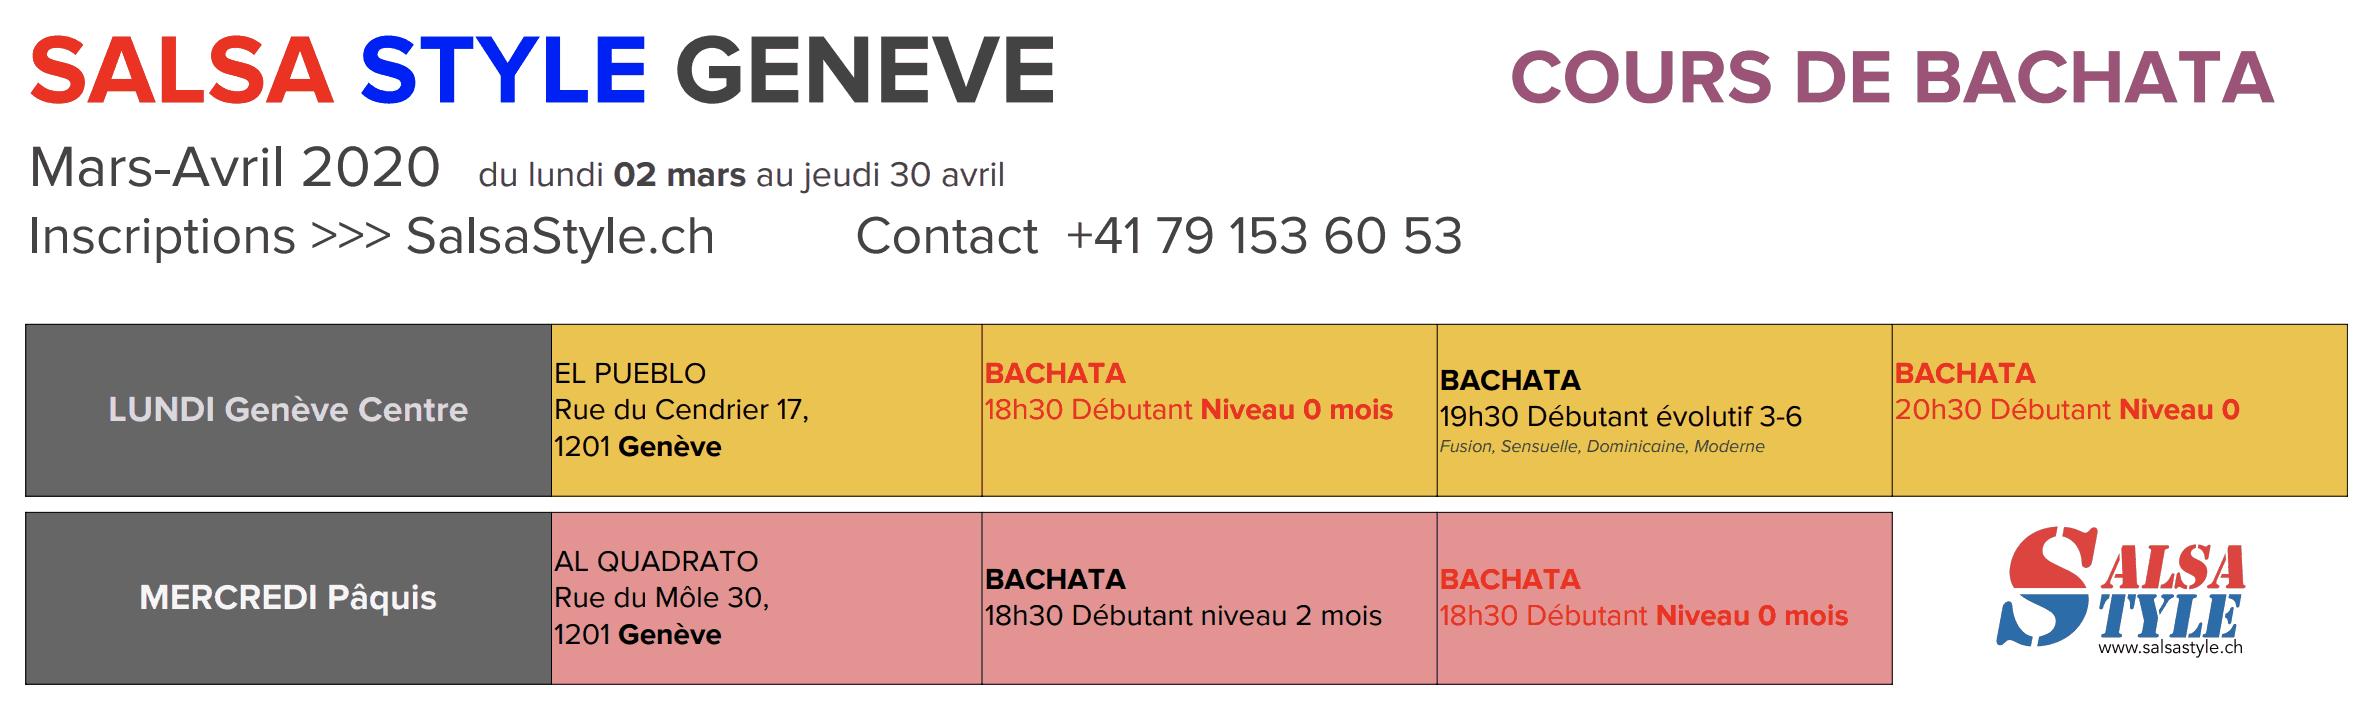 MARS 2020 Bachata à Genève www.SalsaStyle.ch